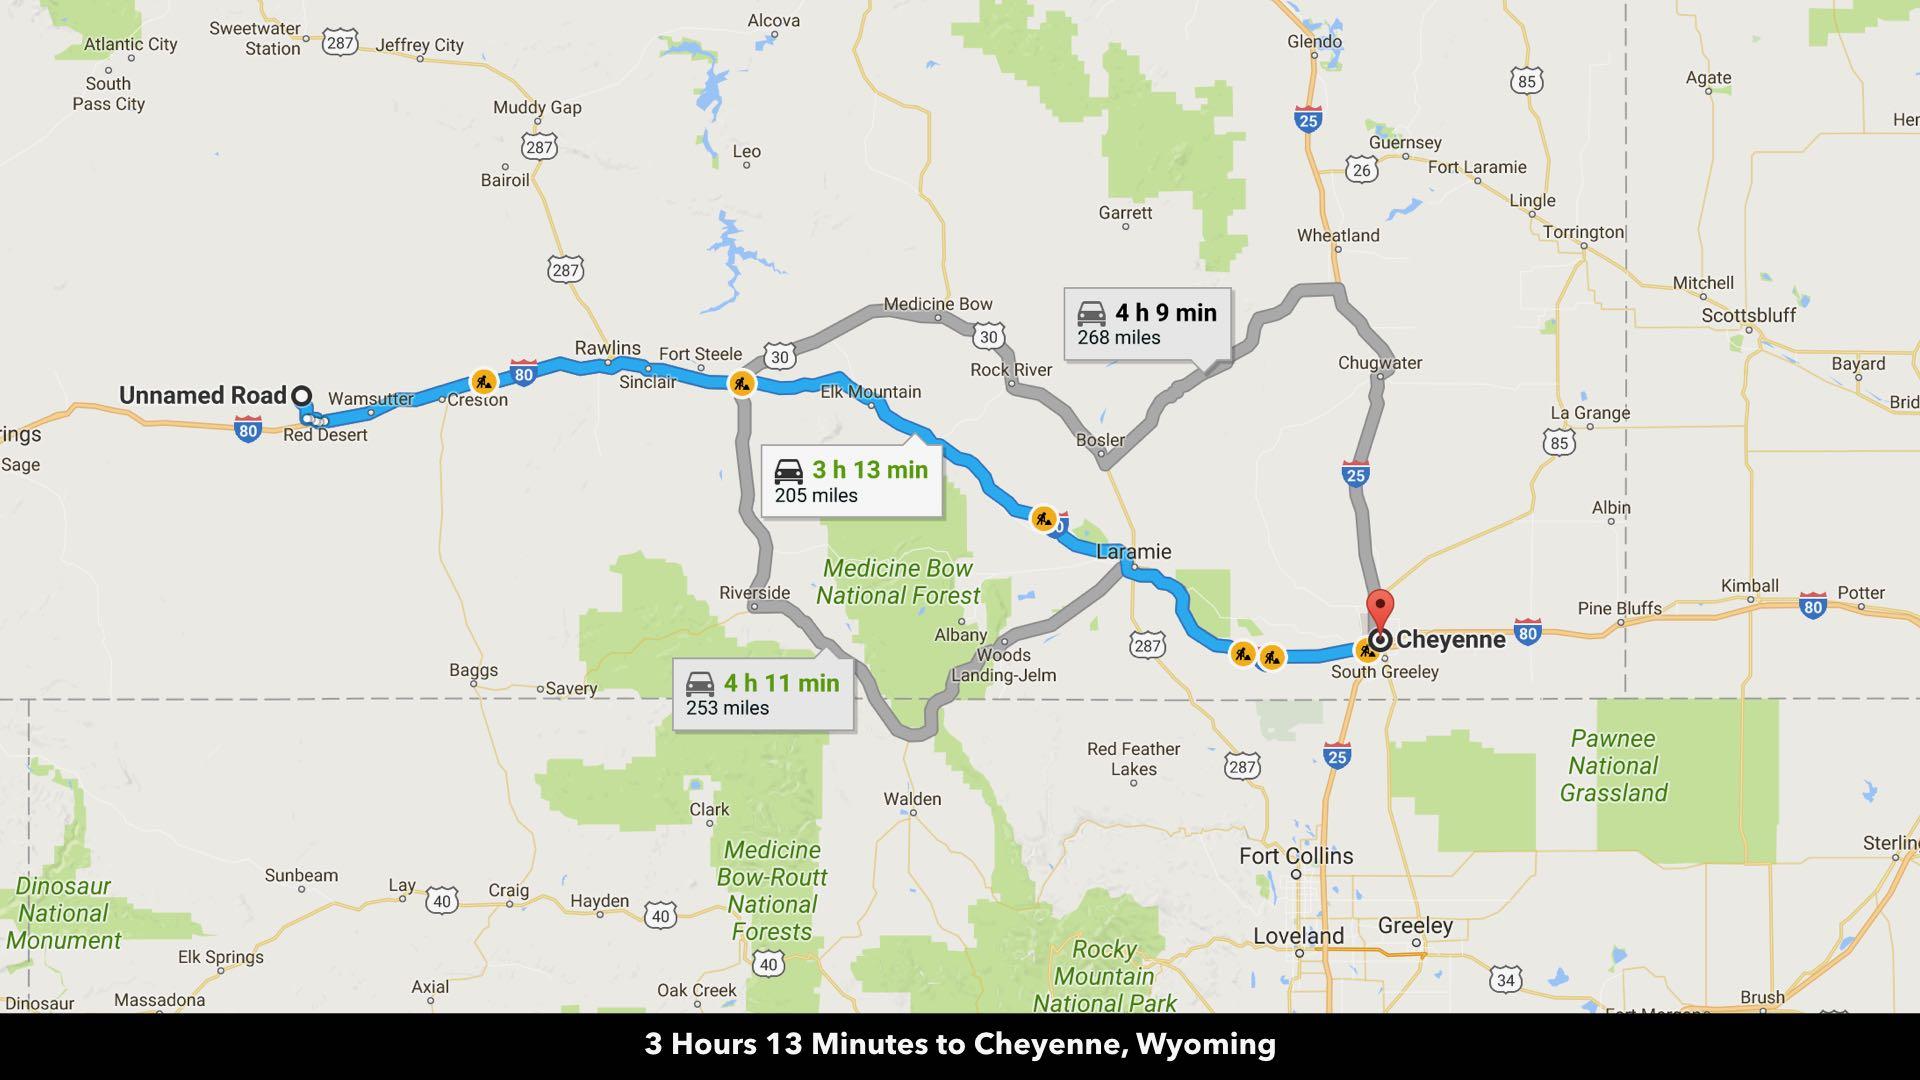 Map Of Cheyenne Wy Binghamton University Map - Road map of wyoming